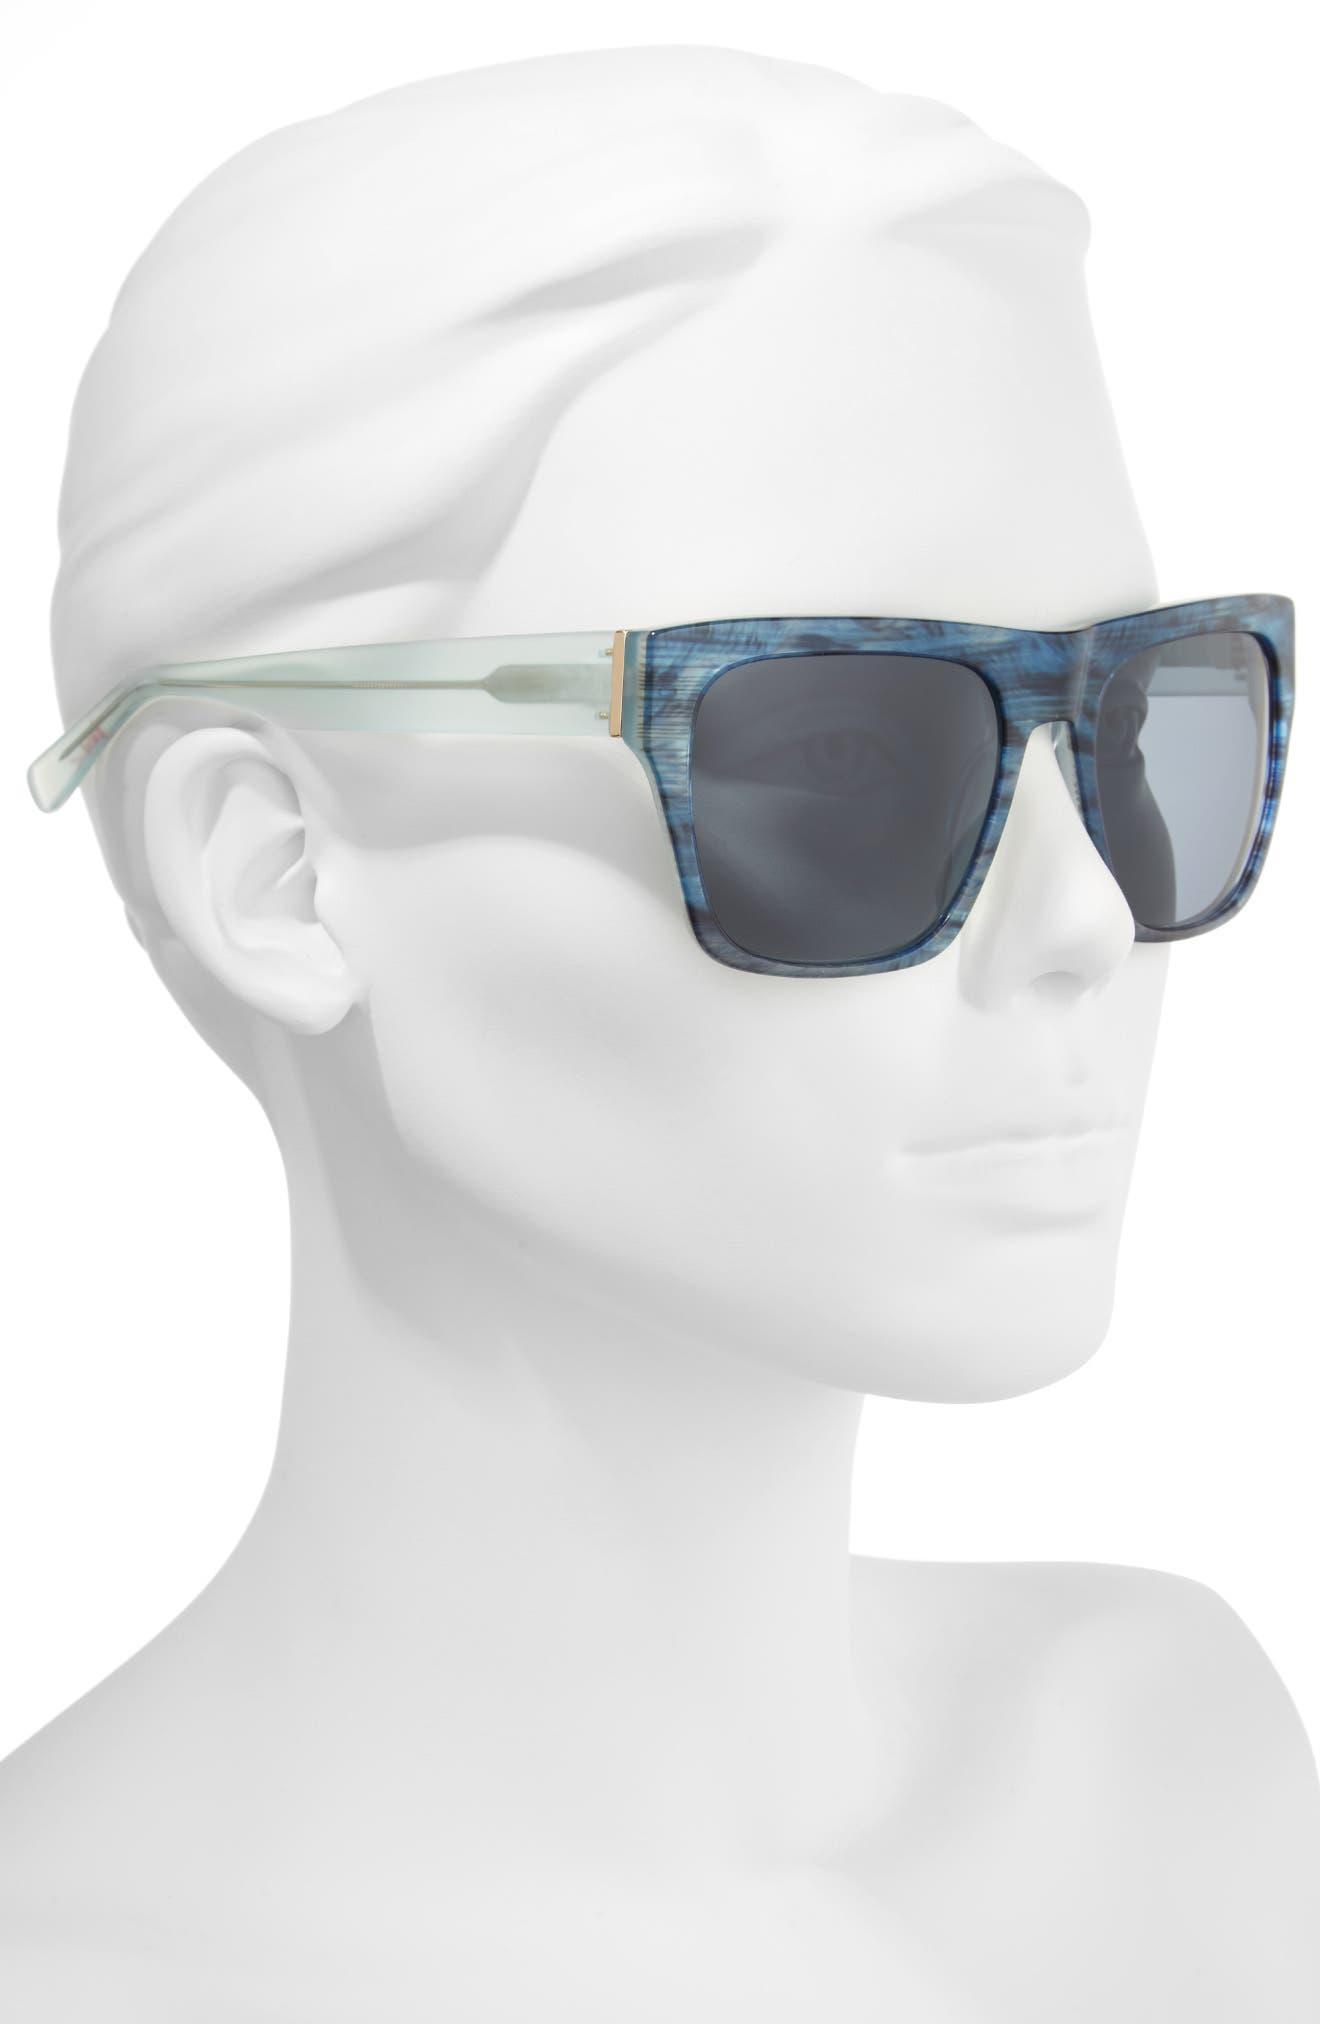 57mm Gradient Square Sunglasses,                             Alternate thumbnail 2, color,                             BLUE FEATHER